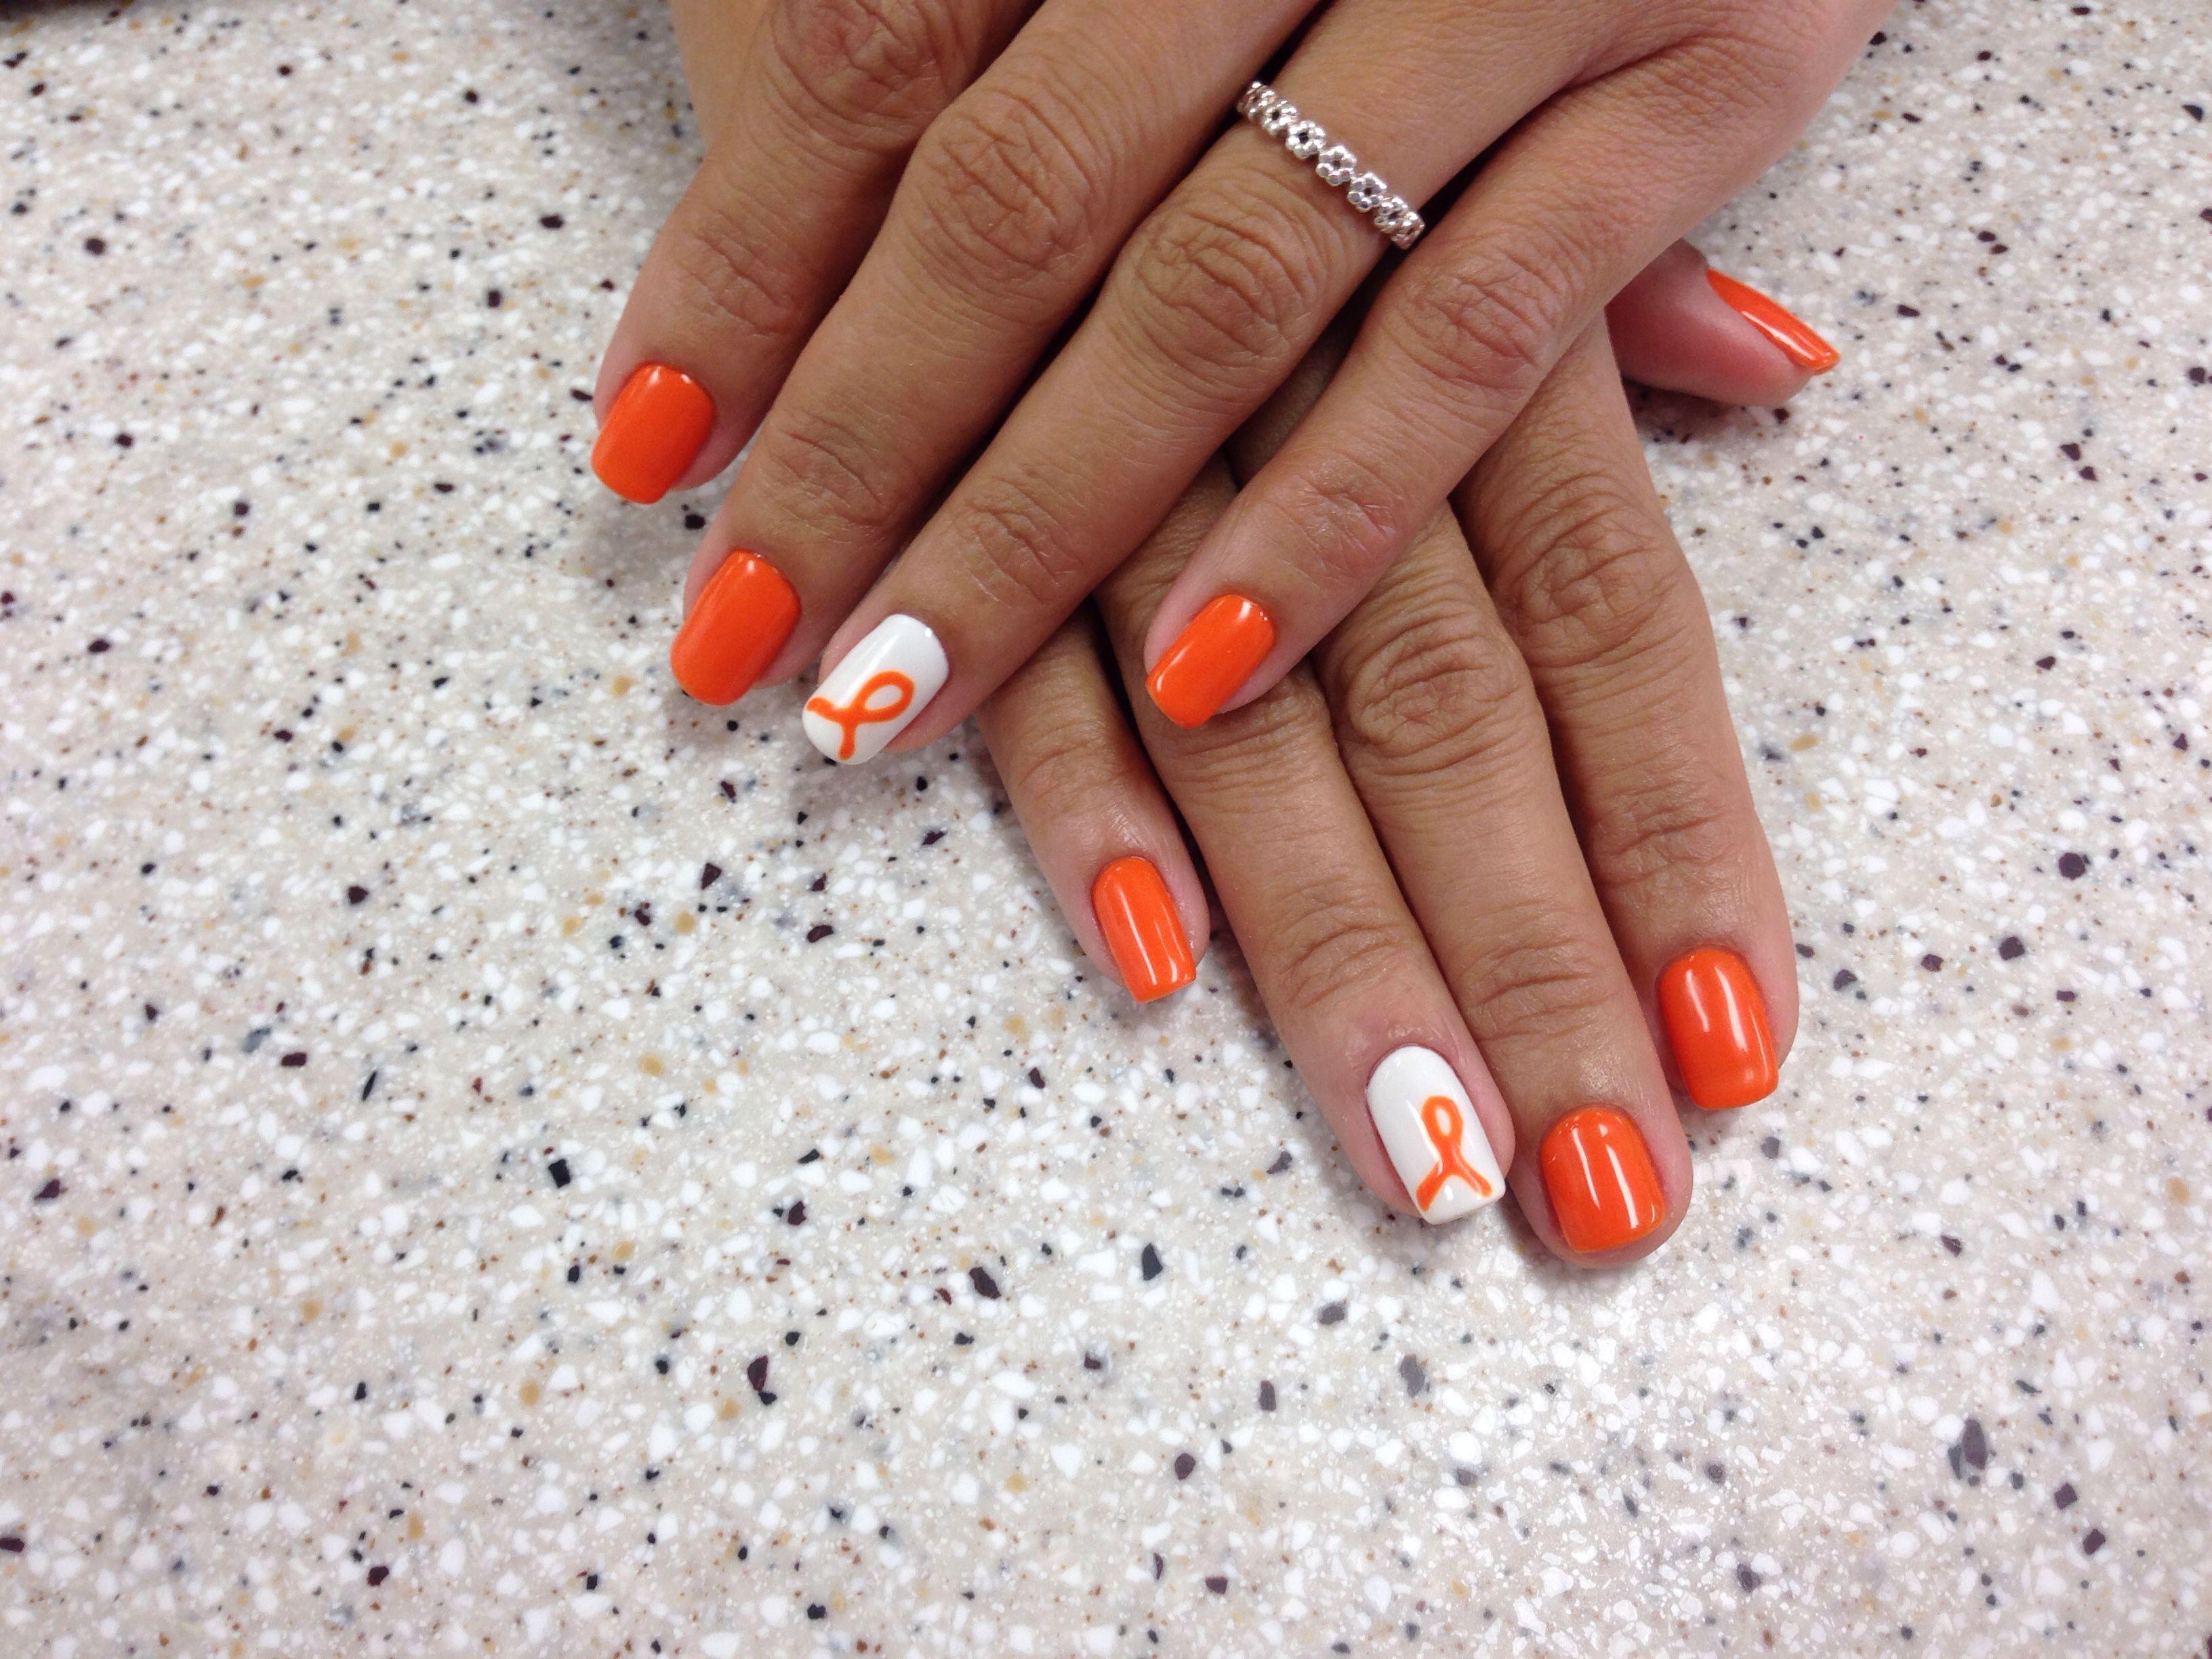 Leukemia Awareness In Honor Of My Mami S Battle Cancer Nails Orange Acrylic Nails Orange Nail Designs